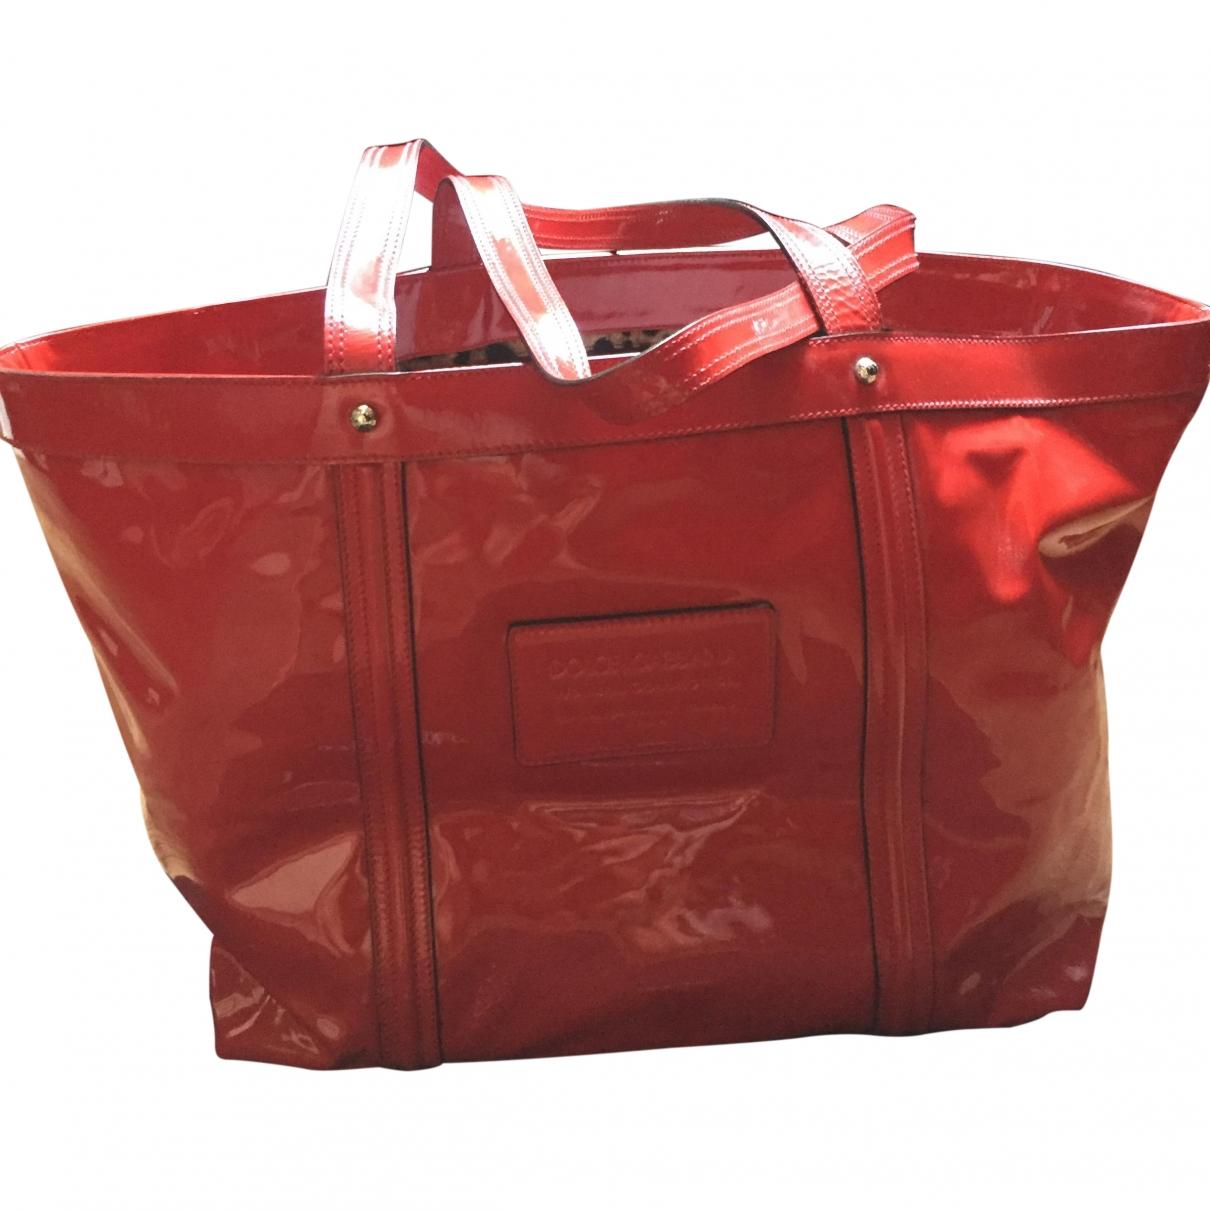 Dolce & Gabbana \N Red Patent leather handbag for Women \N